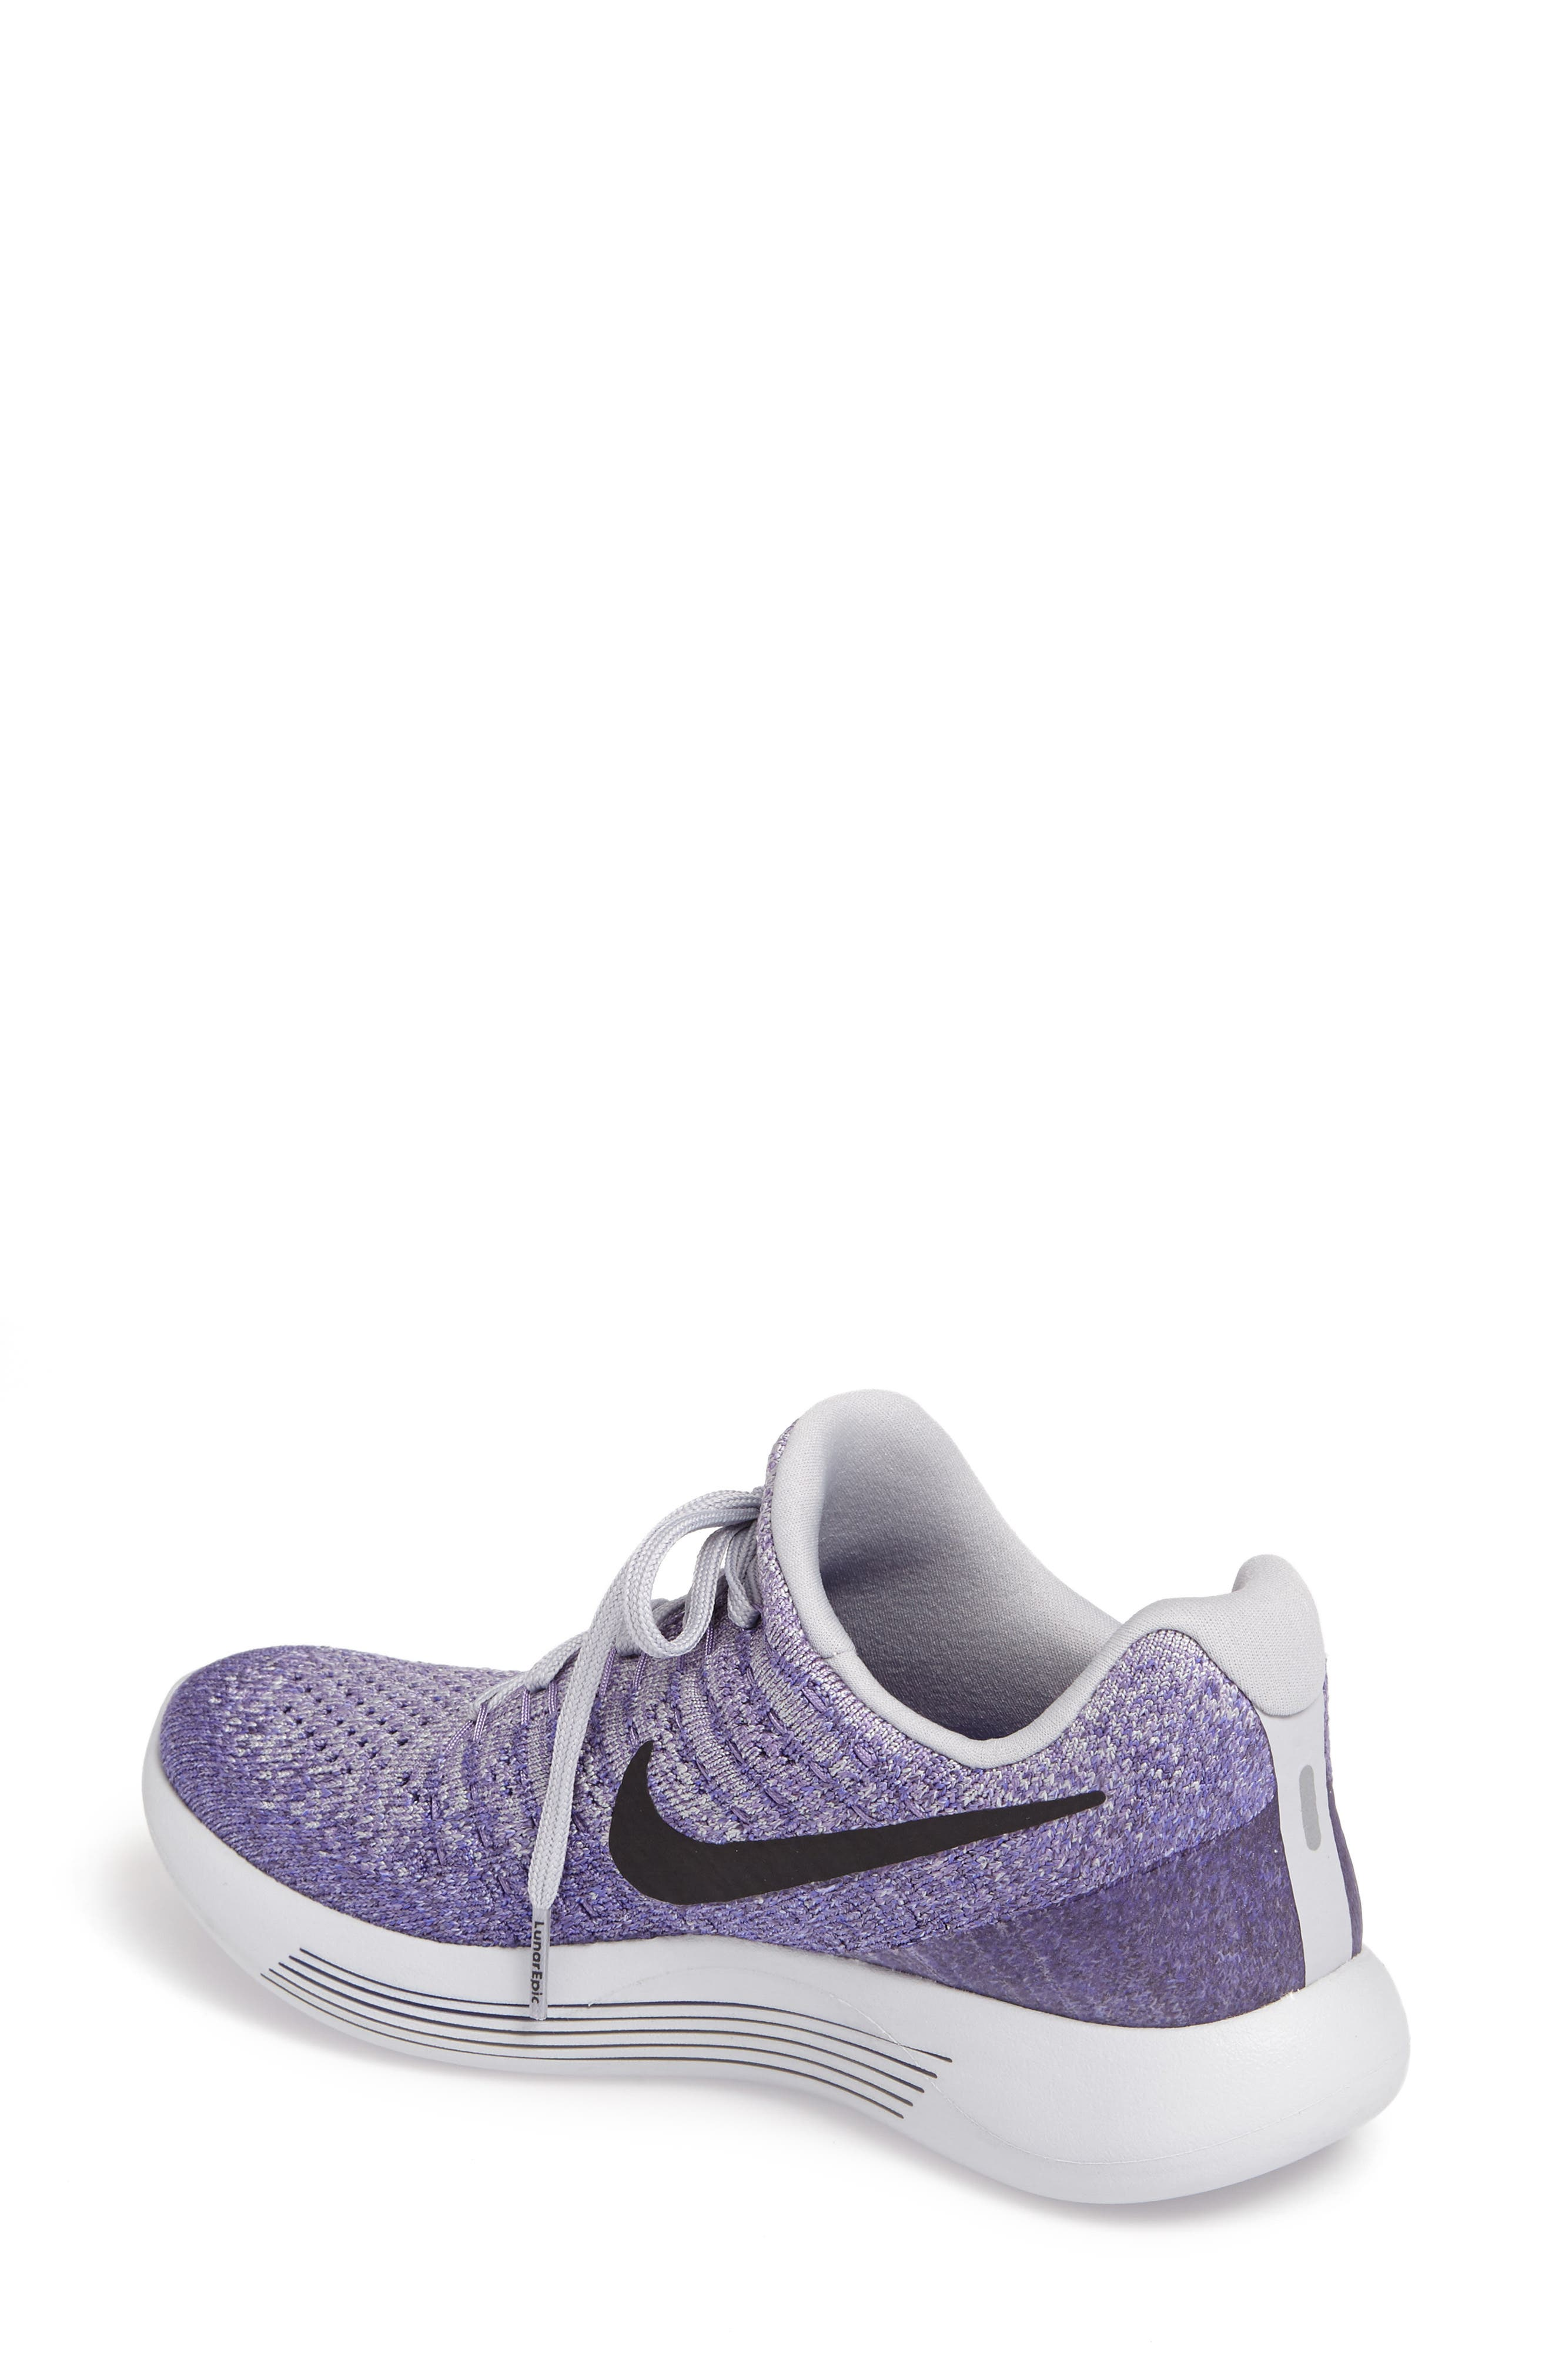 Alternate Image 2  - Nike LunarEpic Low Flyknit 2 Running Shoe (Women)